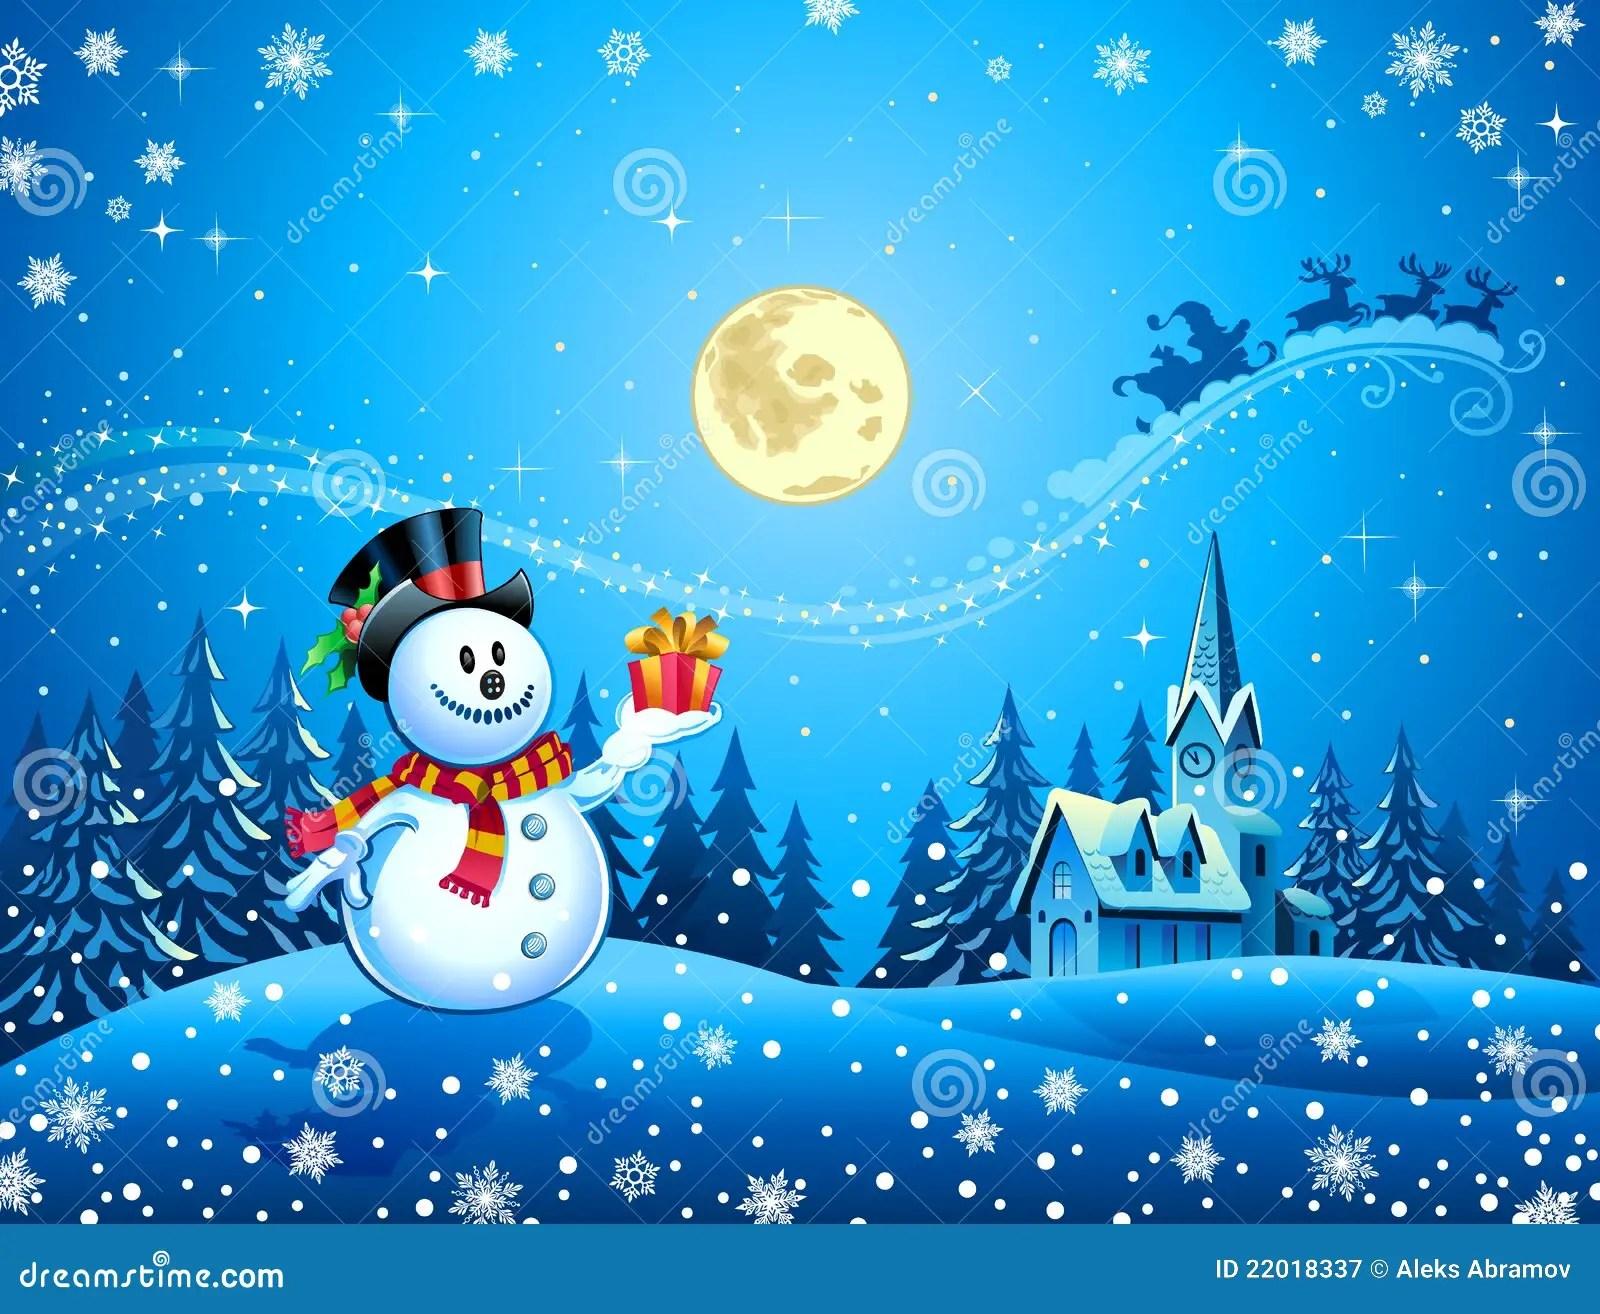 Snowman And Santas Sleigh Stock Vector Illustration Of